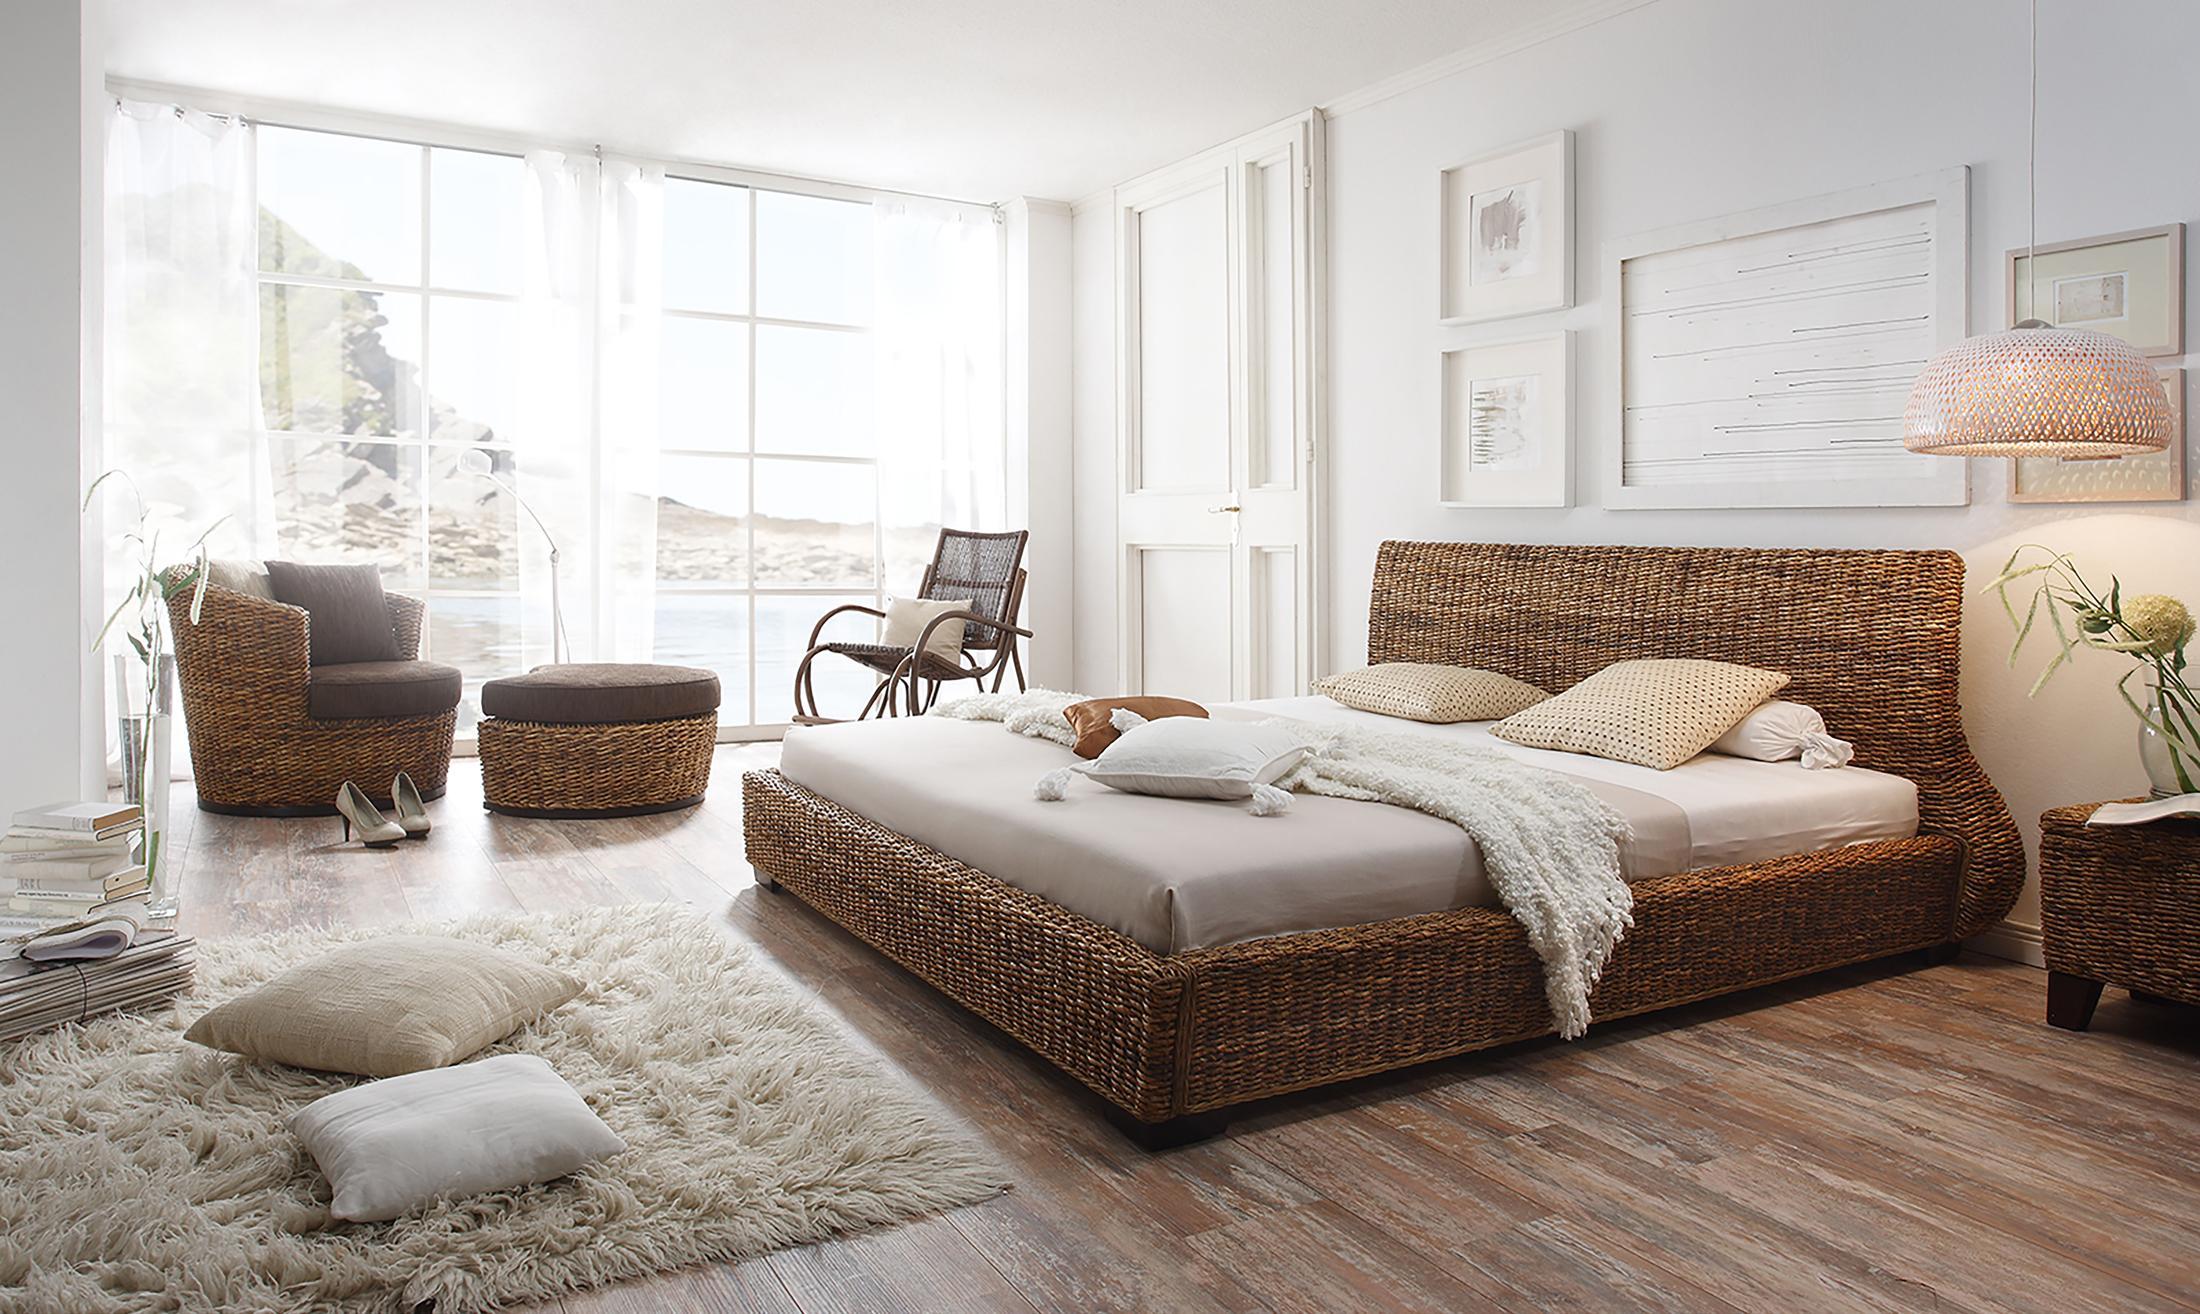 schaukelstuhl aus holz bilder ideen couchstyle. Black Bedroom Furniture Sets. Home Design Ideas